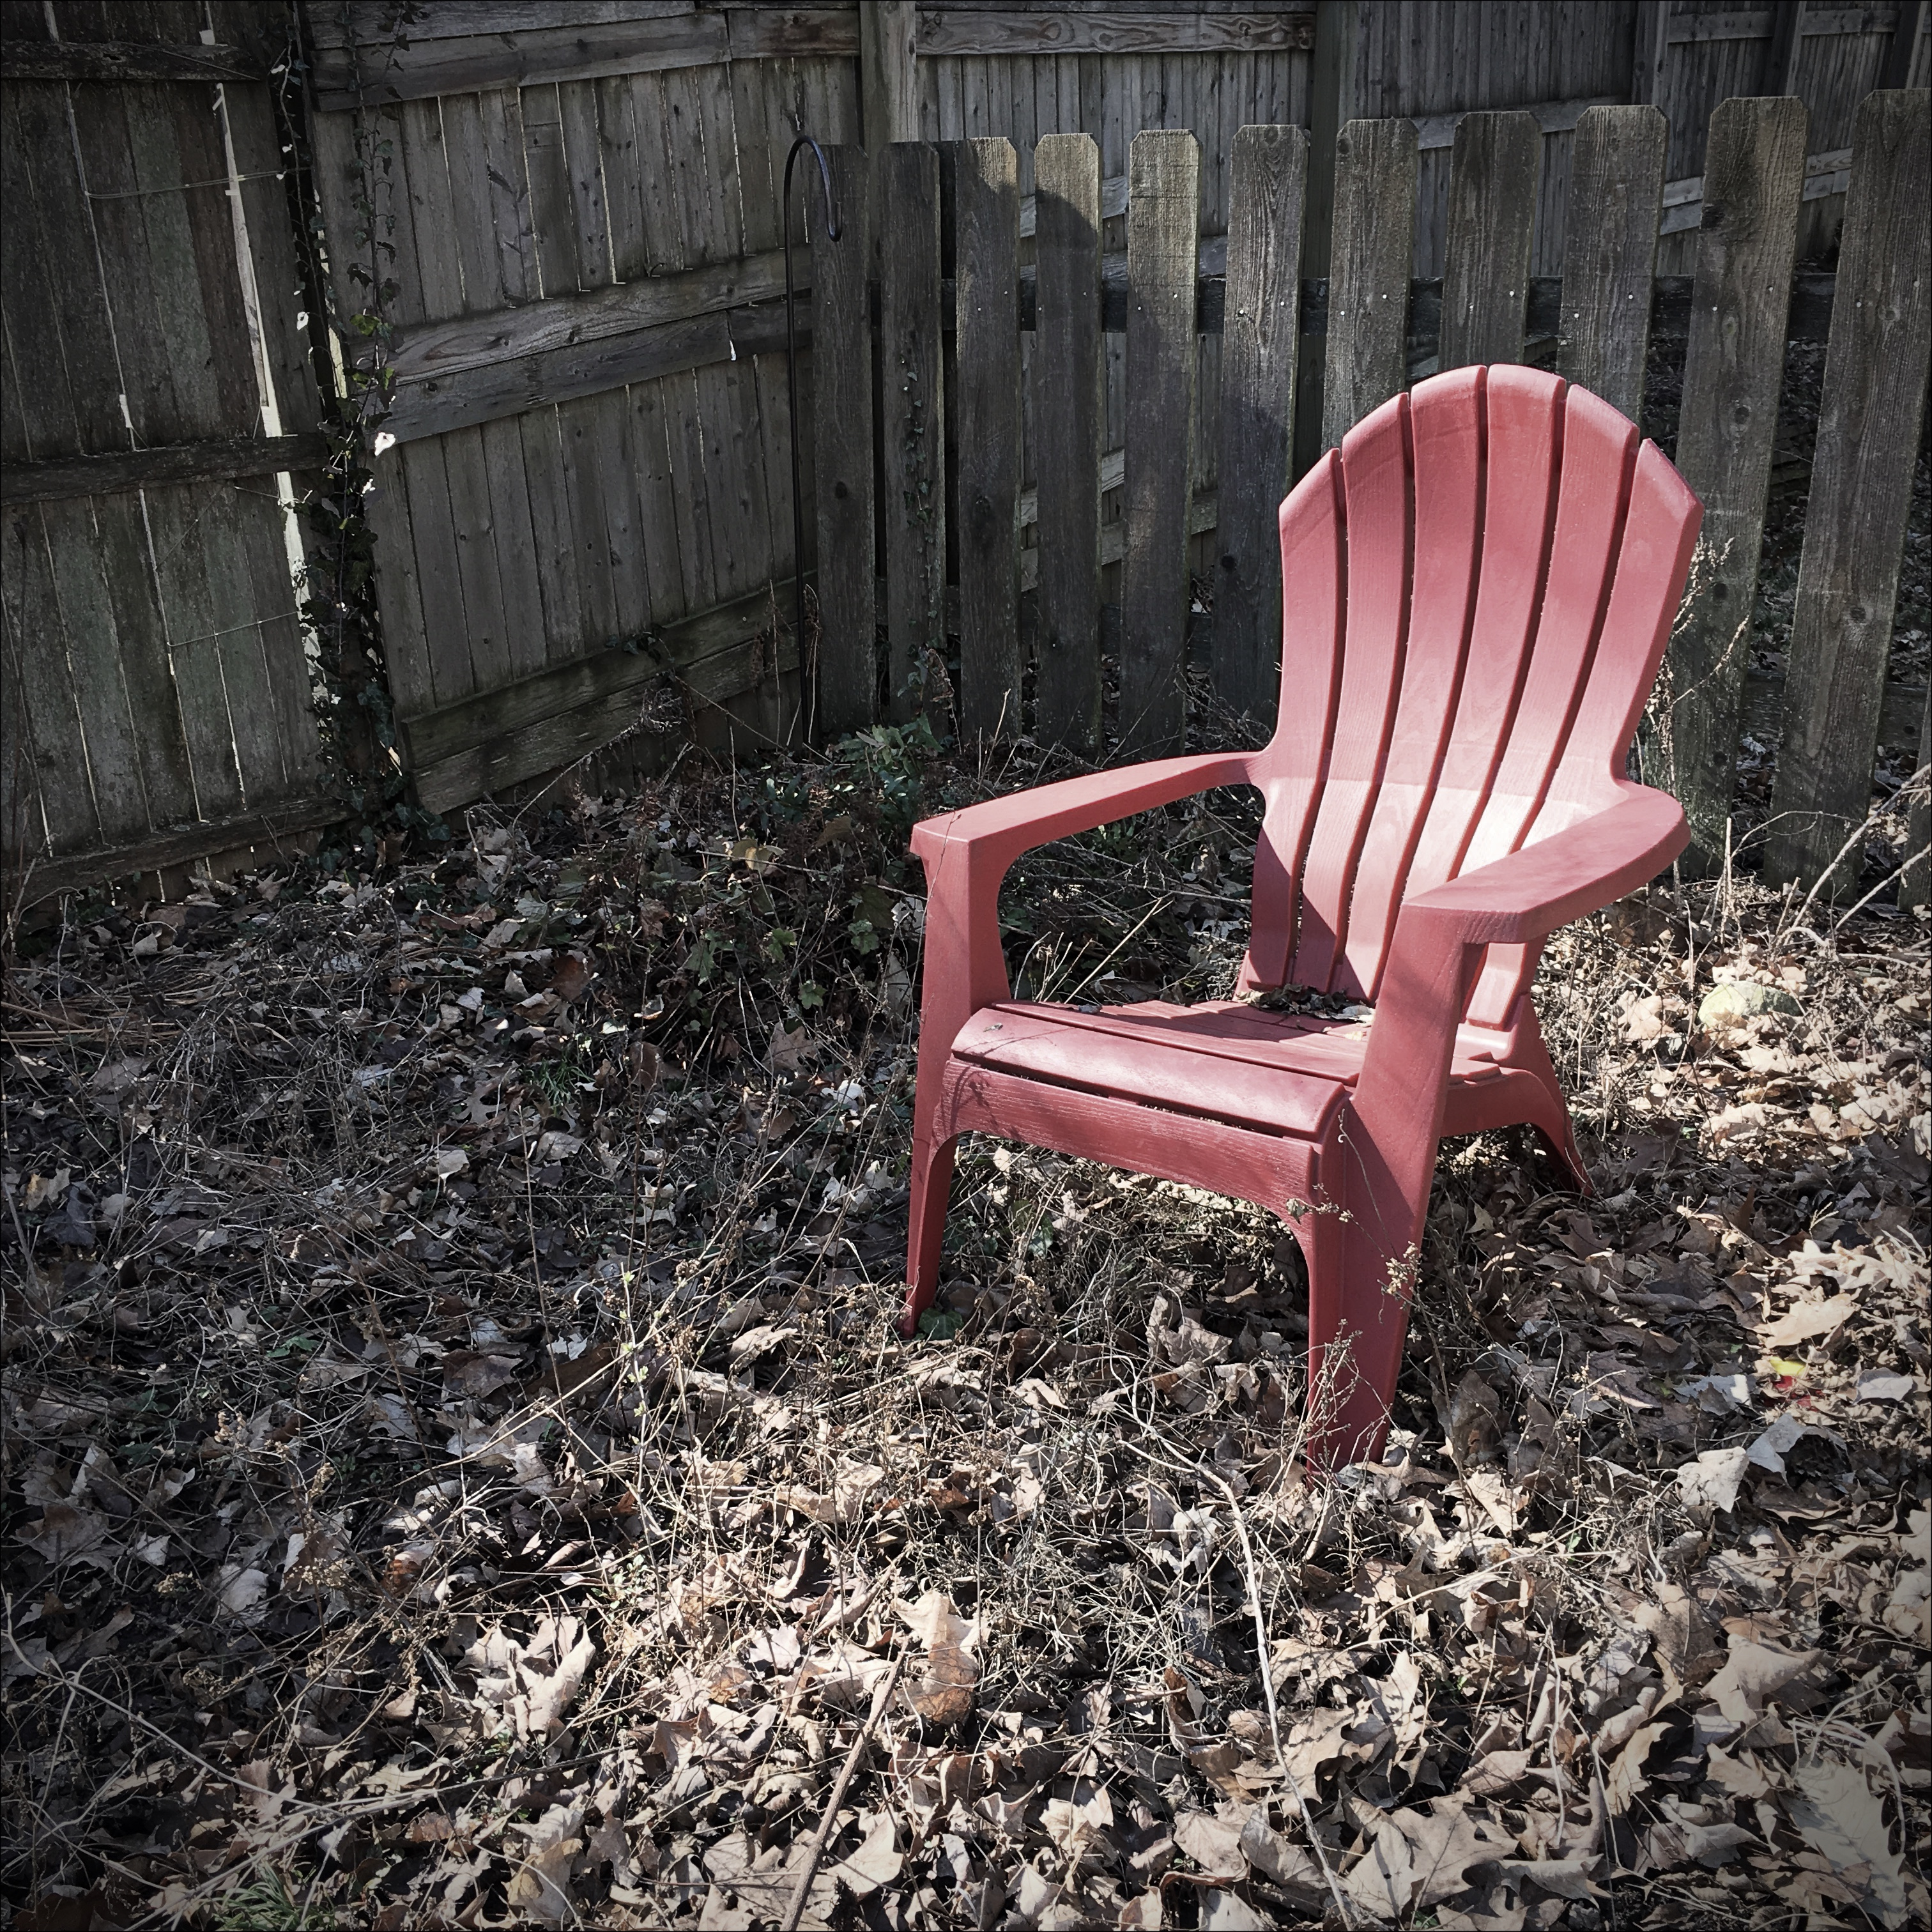 Red chair photography - Red Chair Photography 58